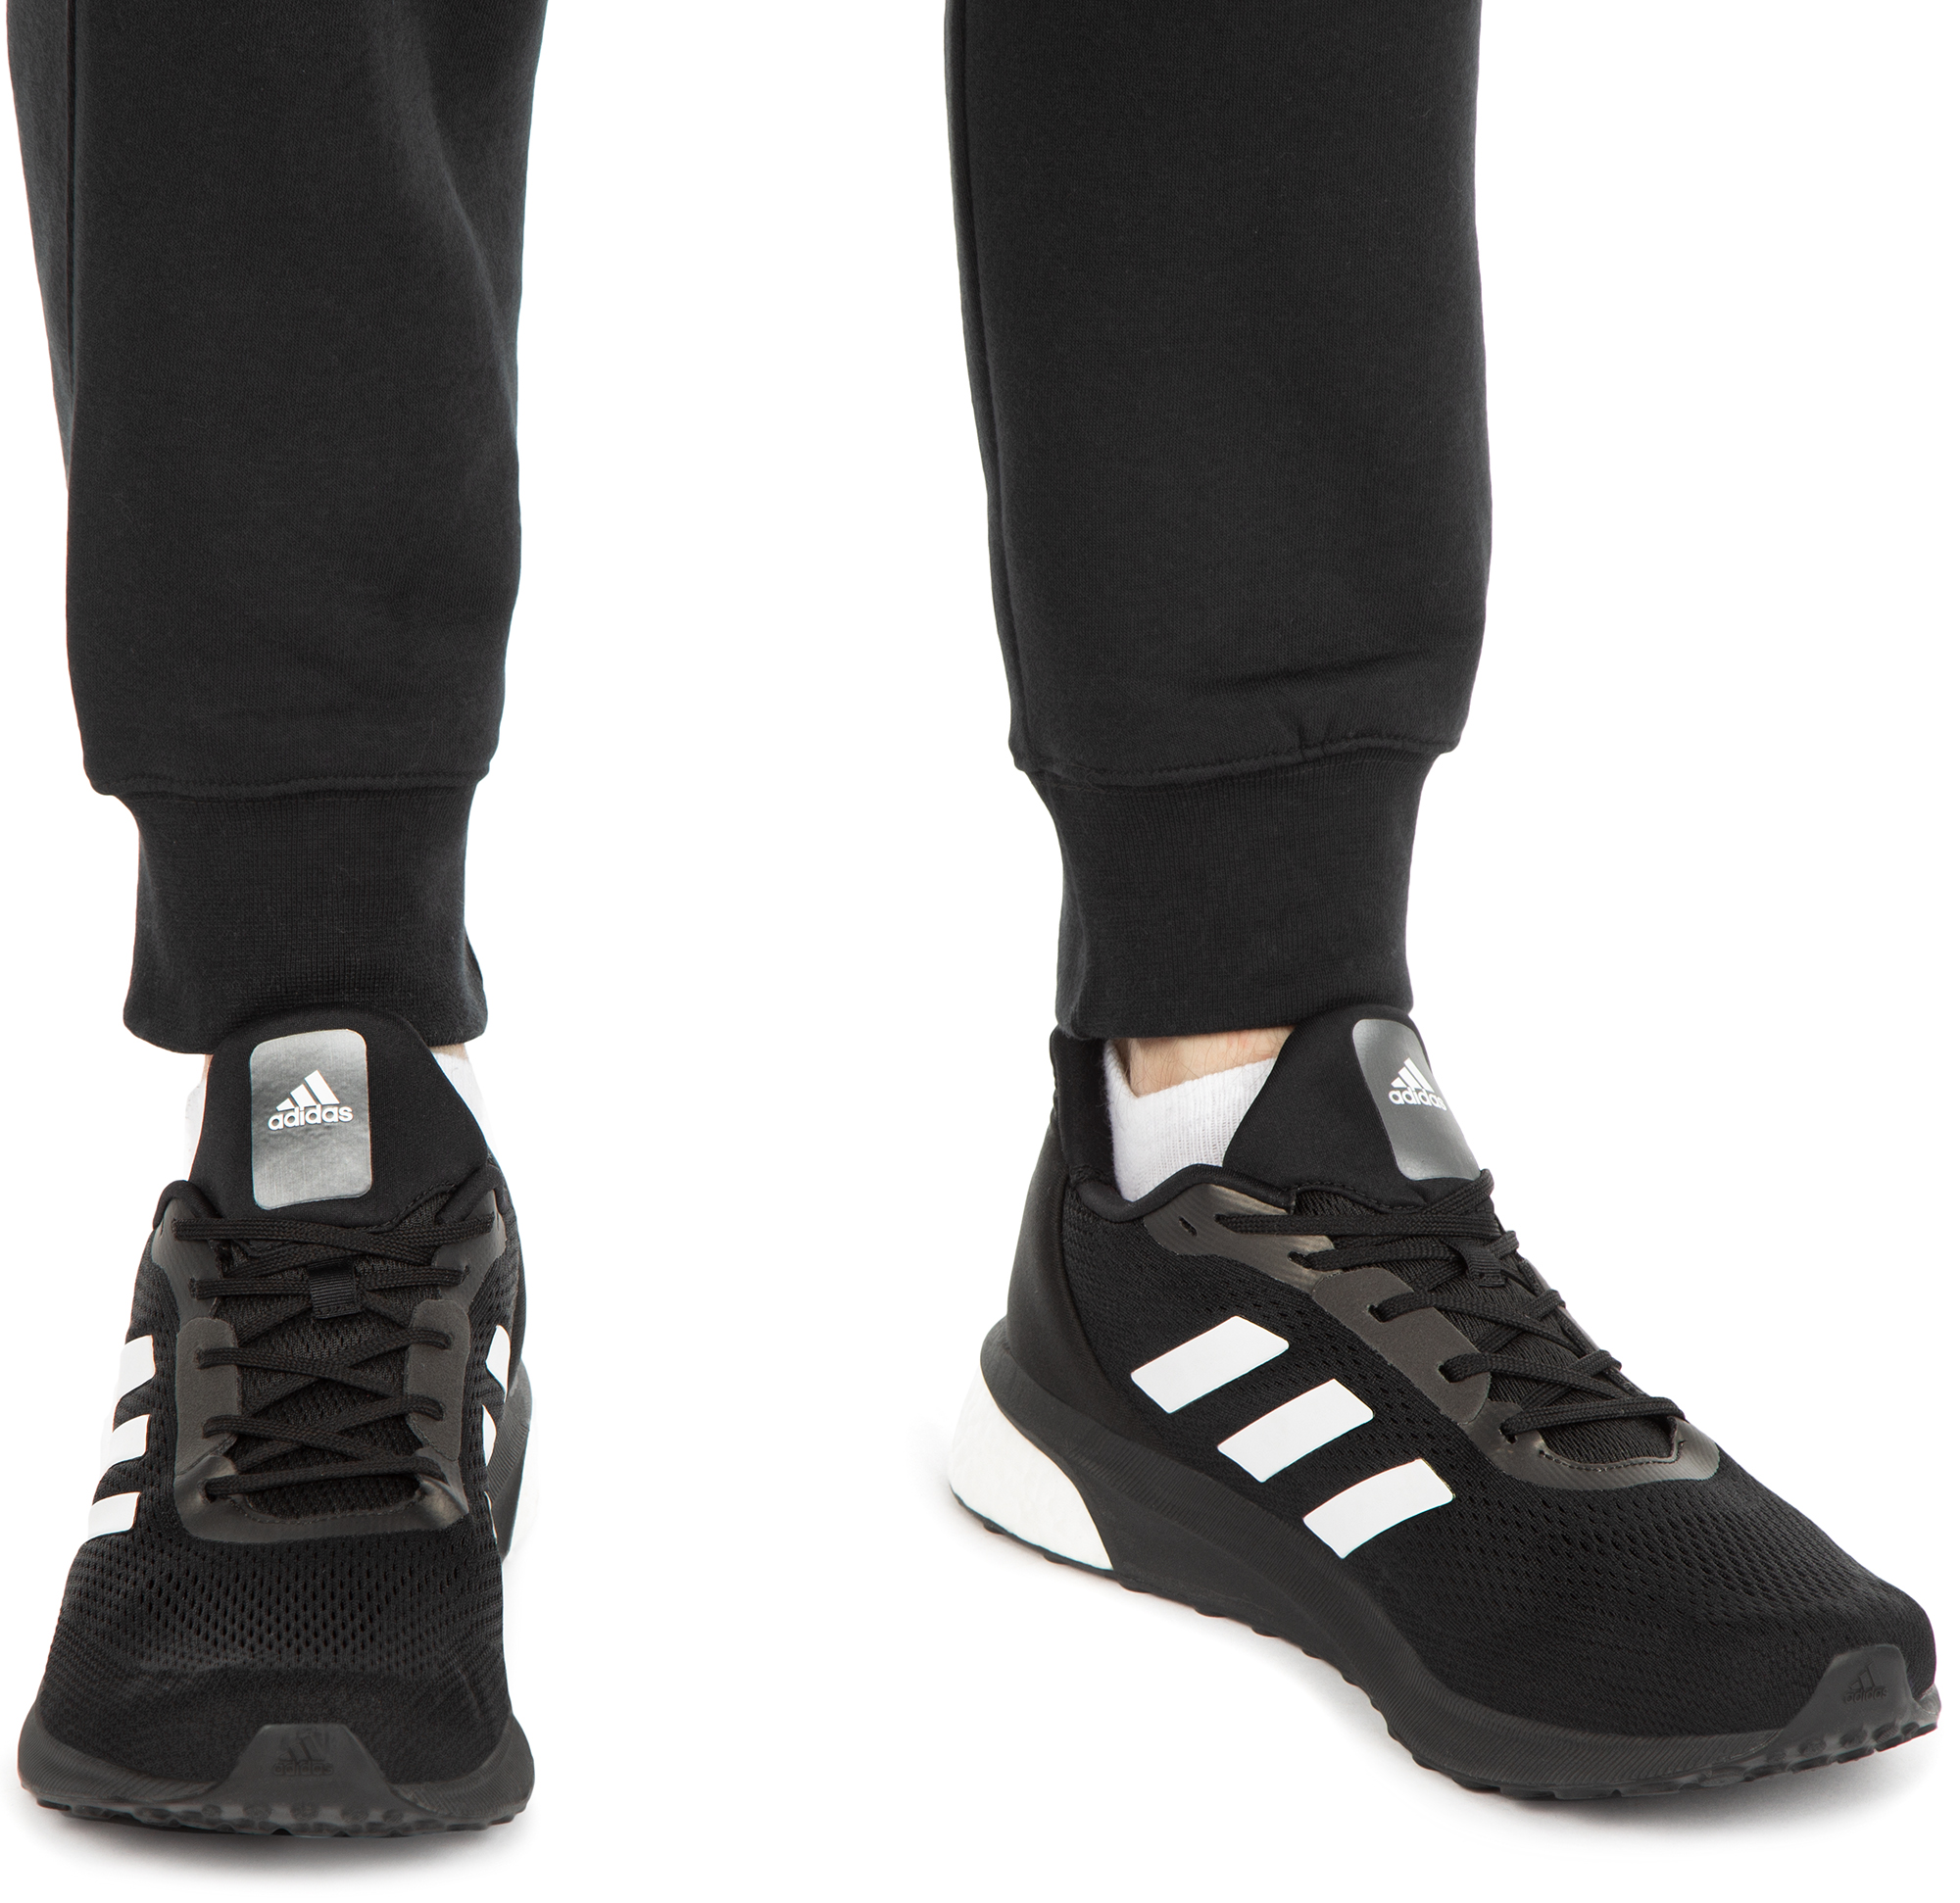 Adidas Кроссовки мужские Astrarun, размер 44,5